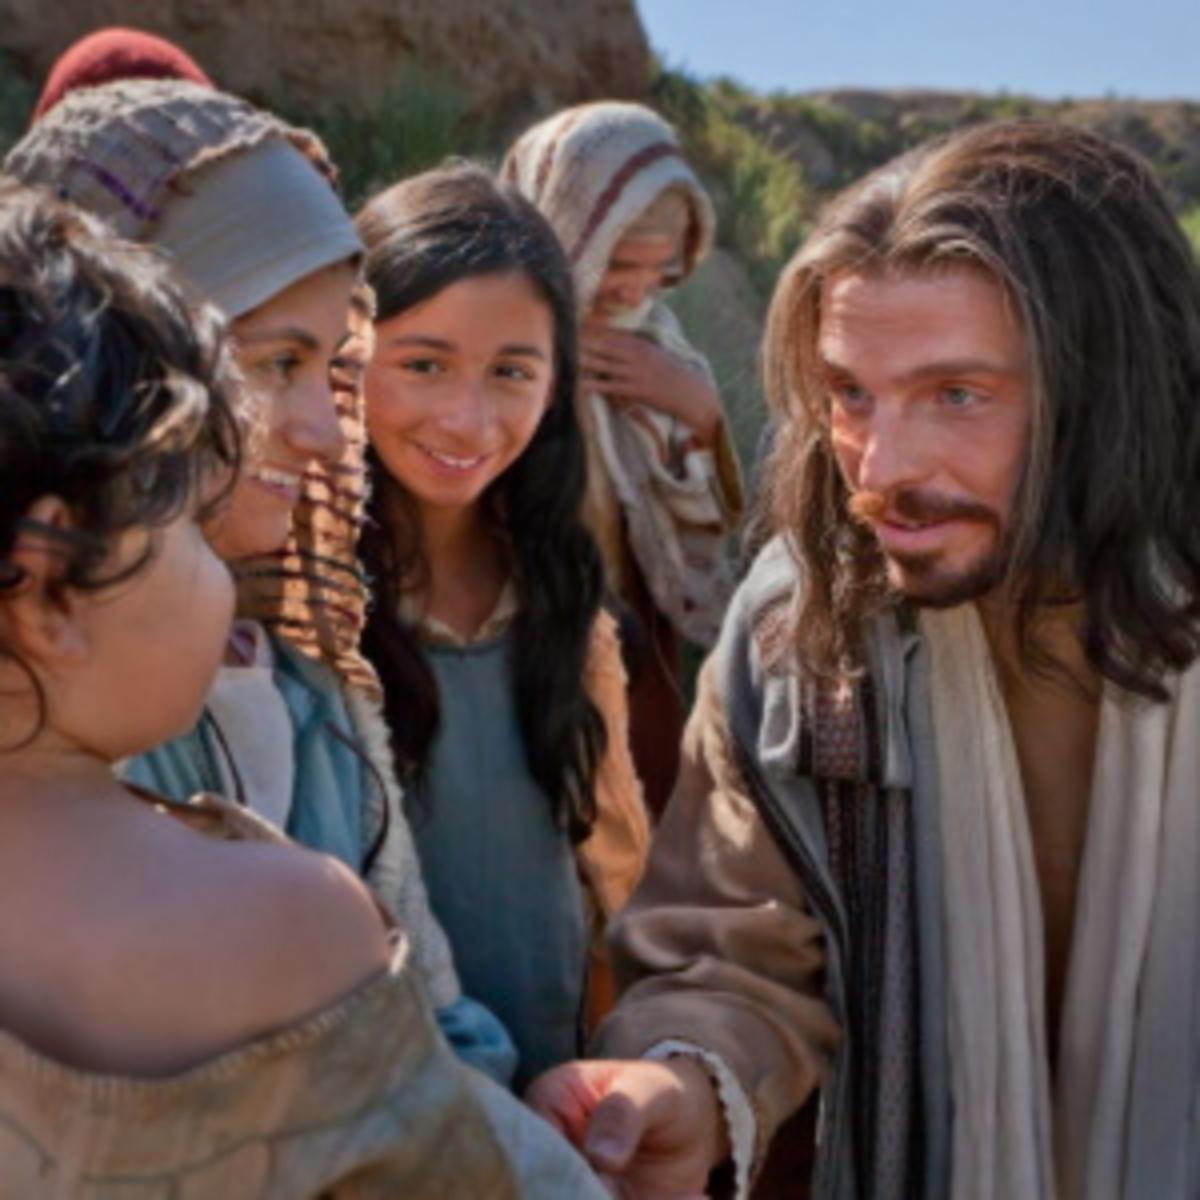 Jesus and Chrildren